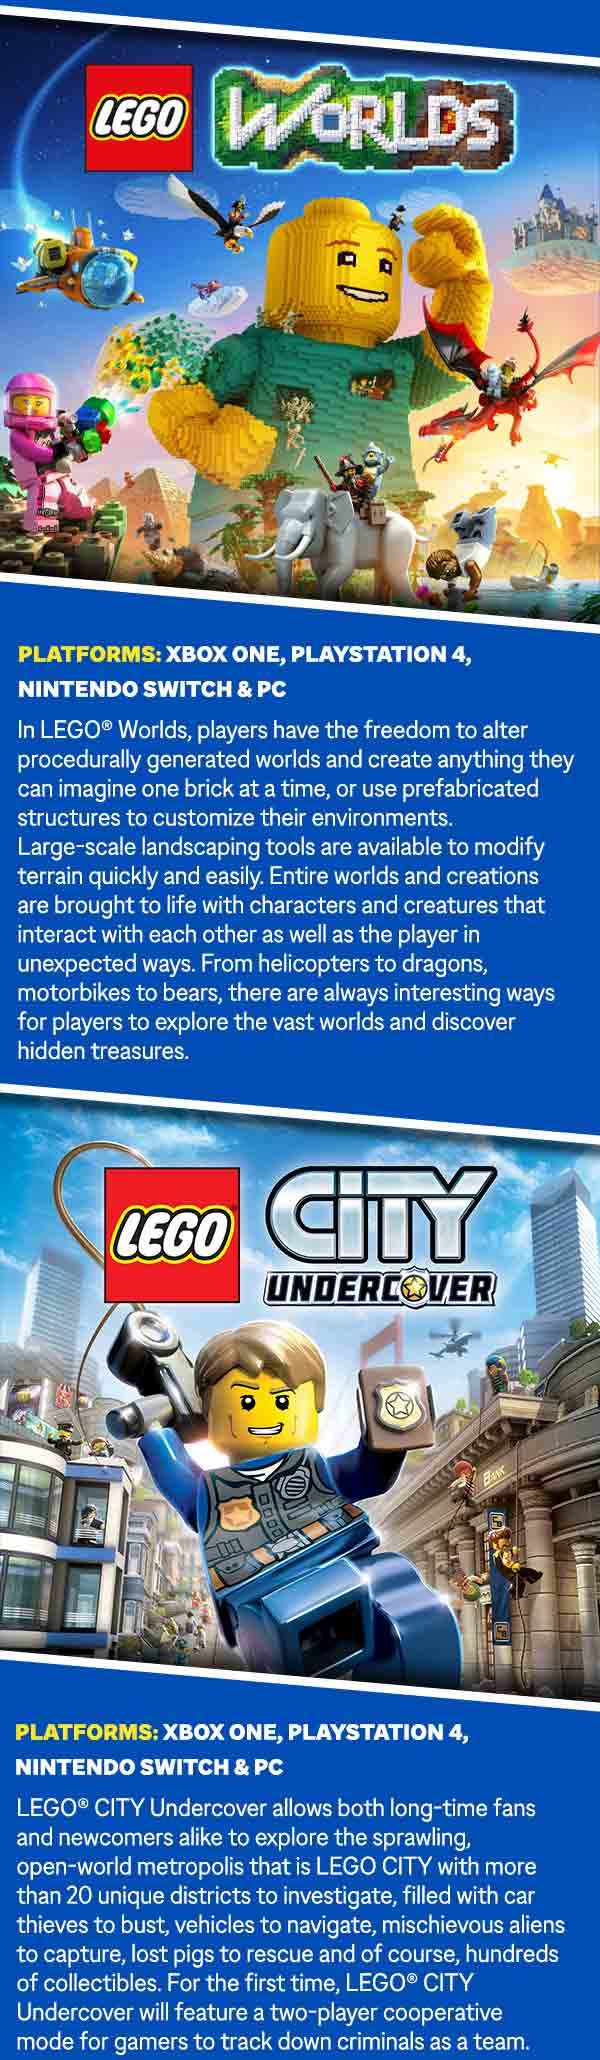 City Undercover LEGO Artwork